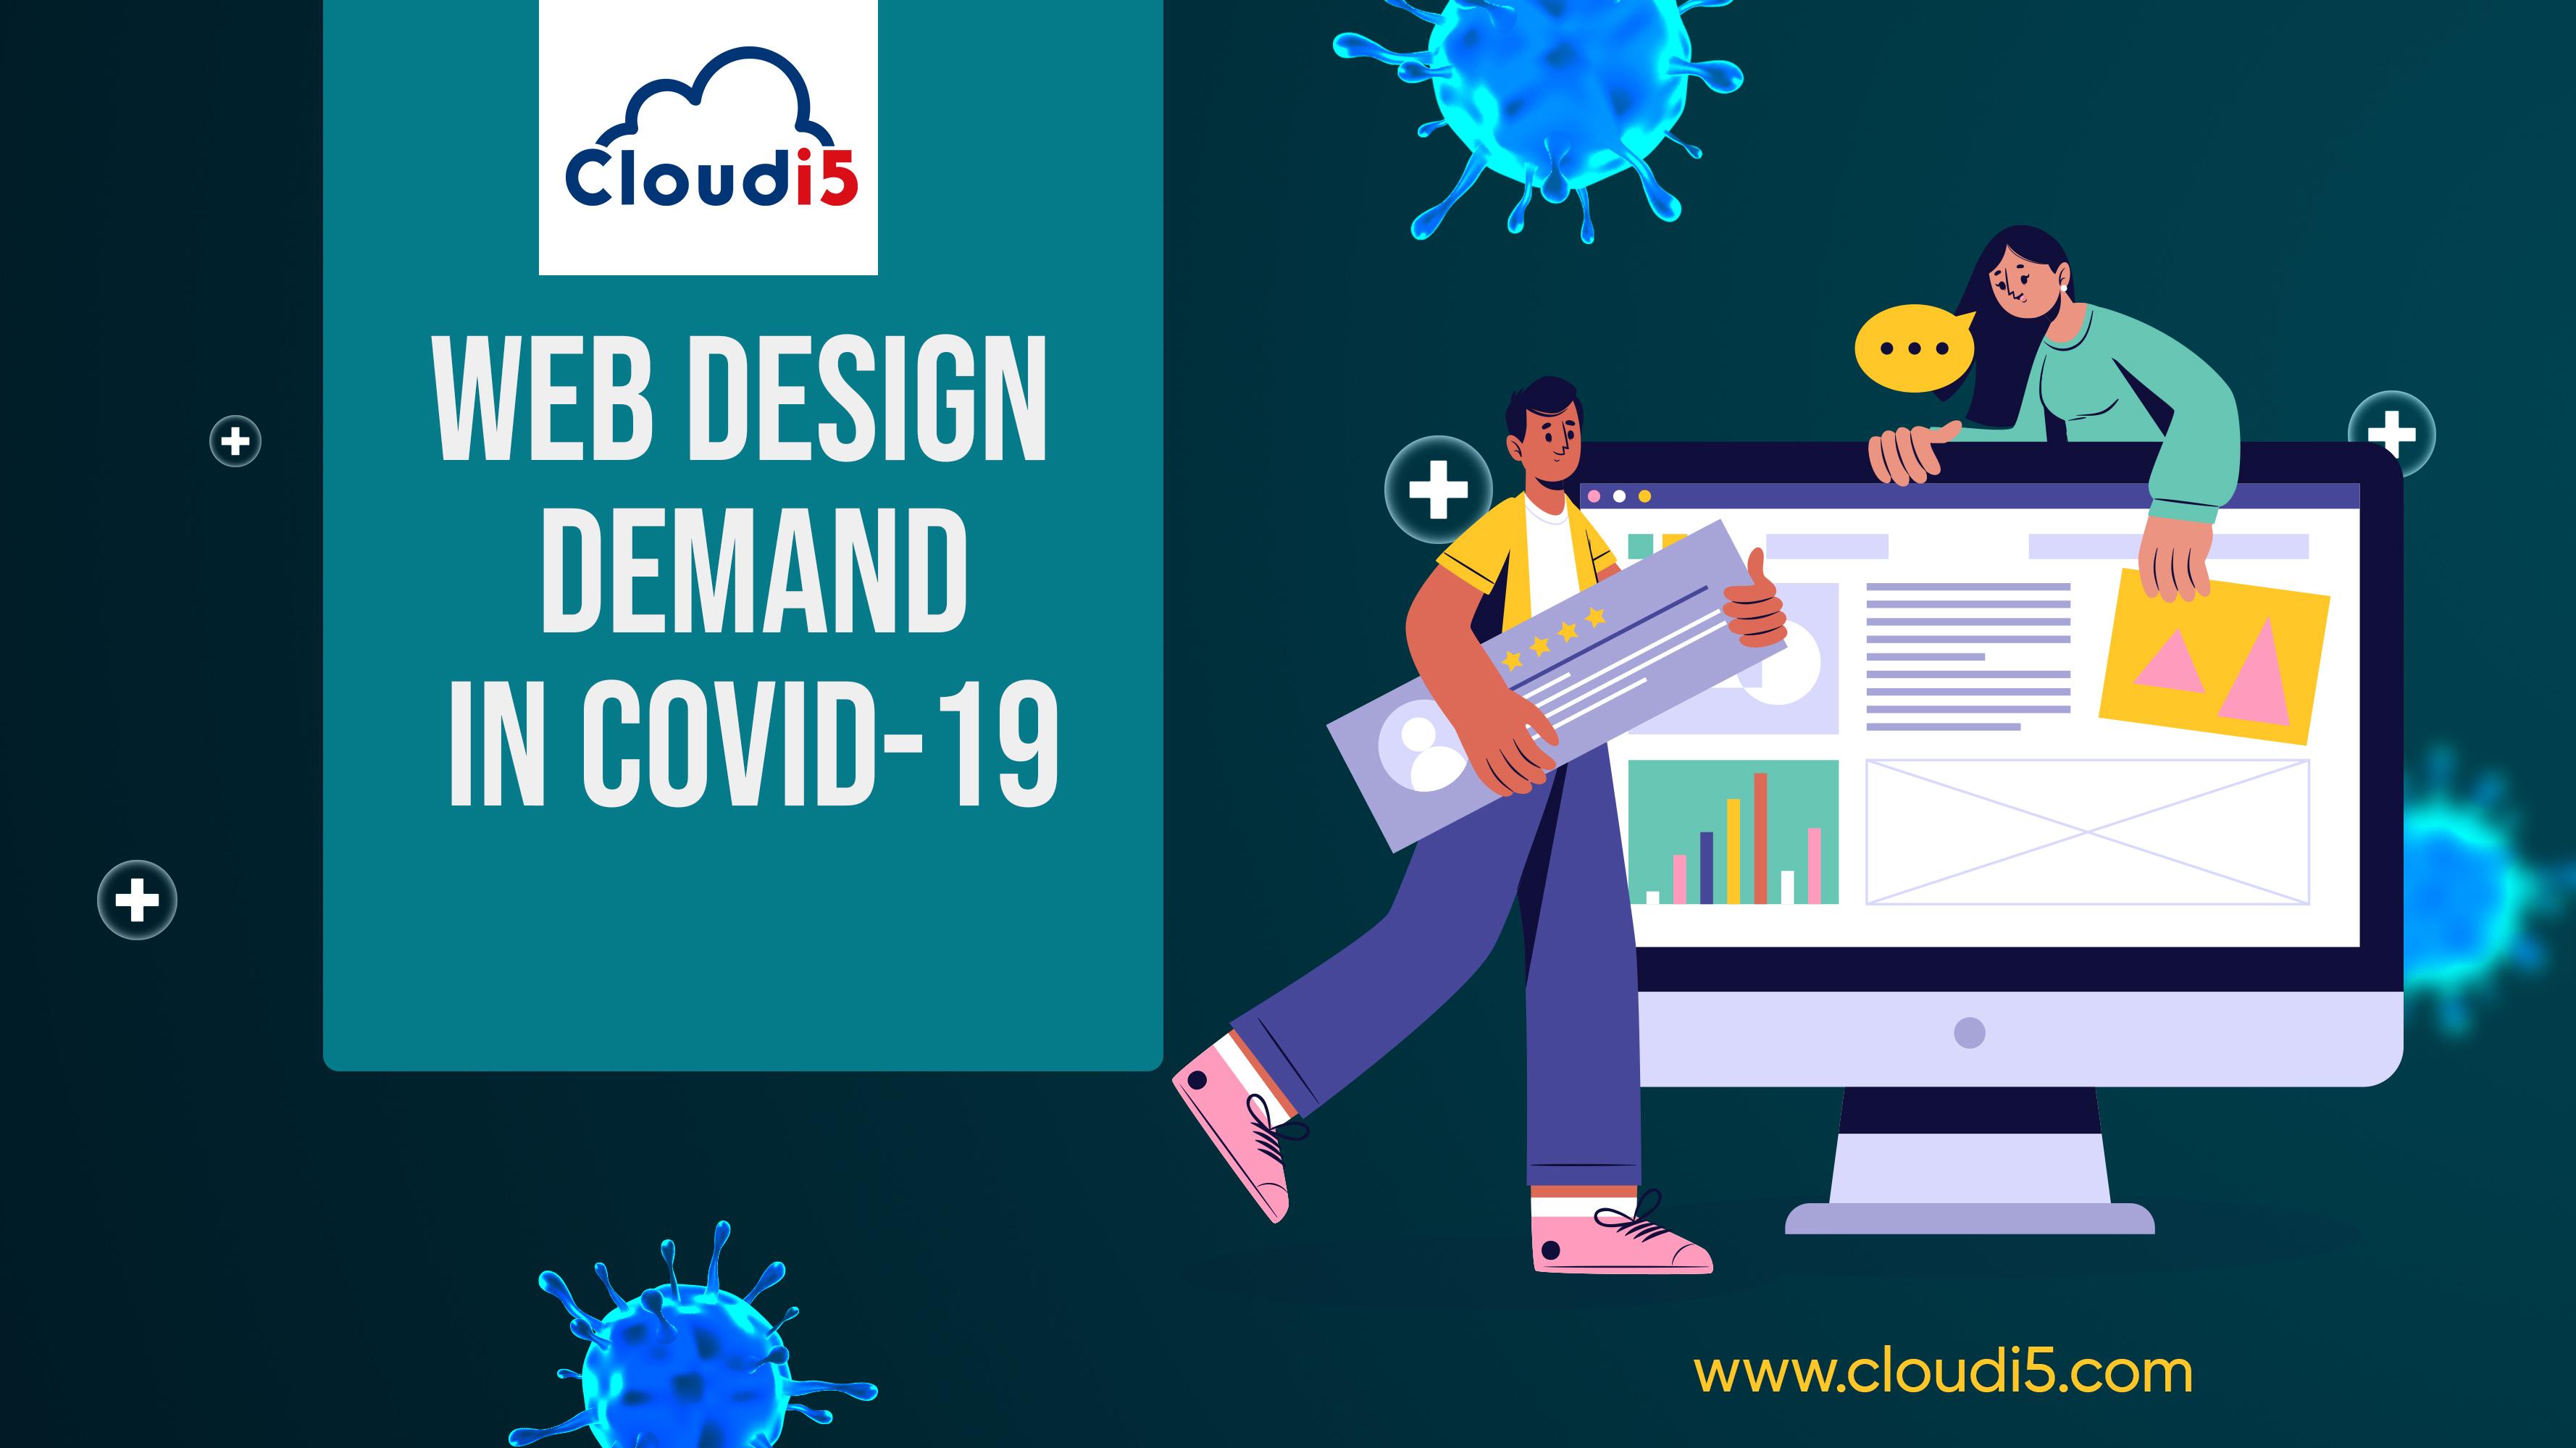 Web design and rising demand in COVID